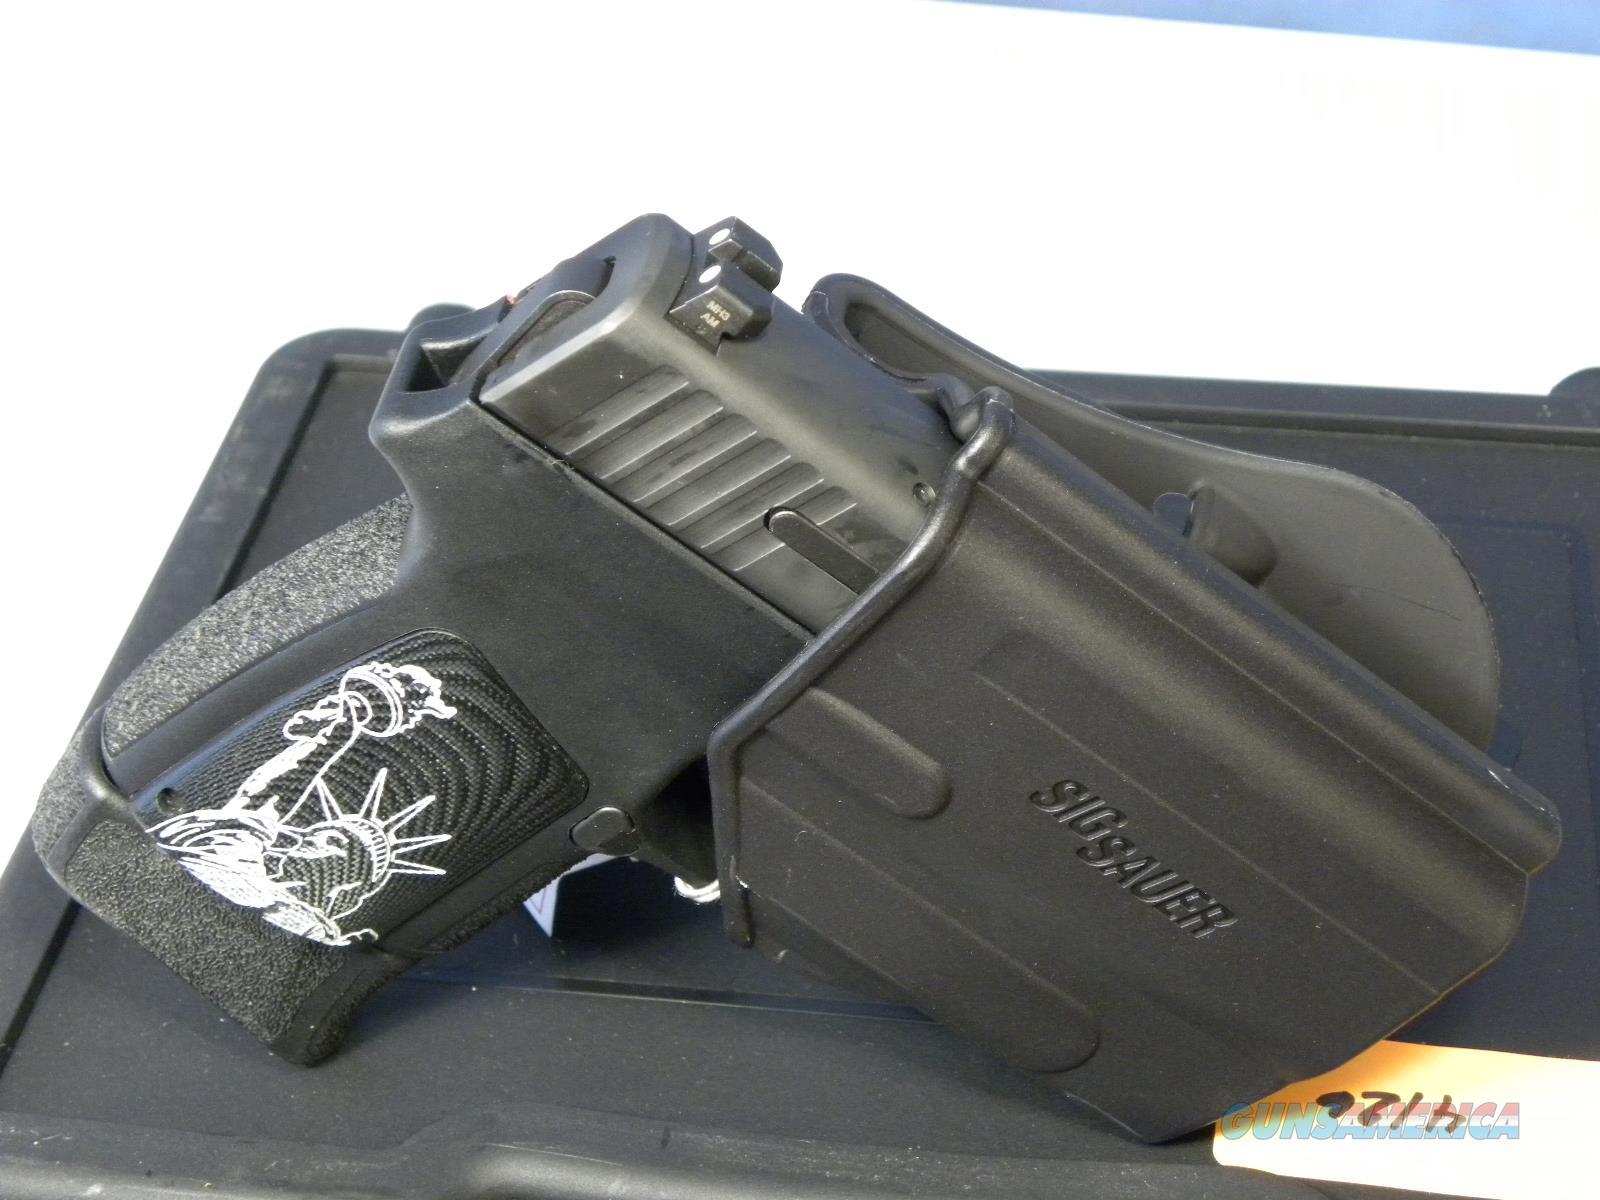 Sig Sauer 290RS-9-Liberty Edition  Guns > Pistols > Sig - Sauer/Sigarms Pistols > P290